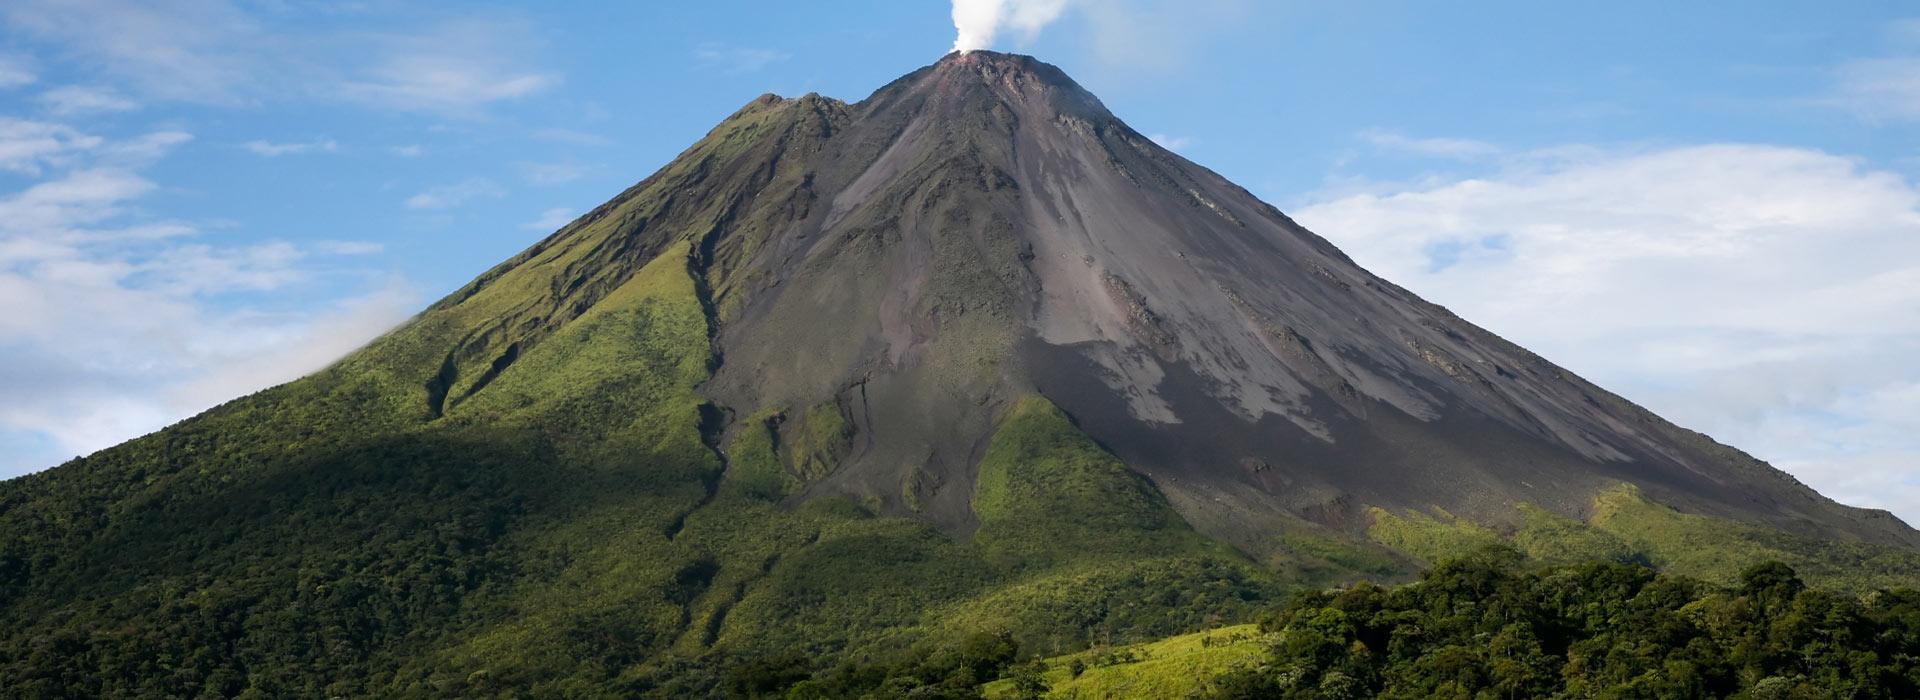 vulcano_arenal